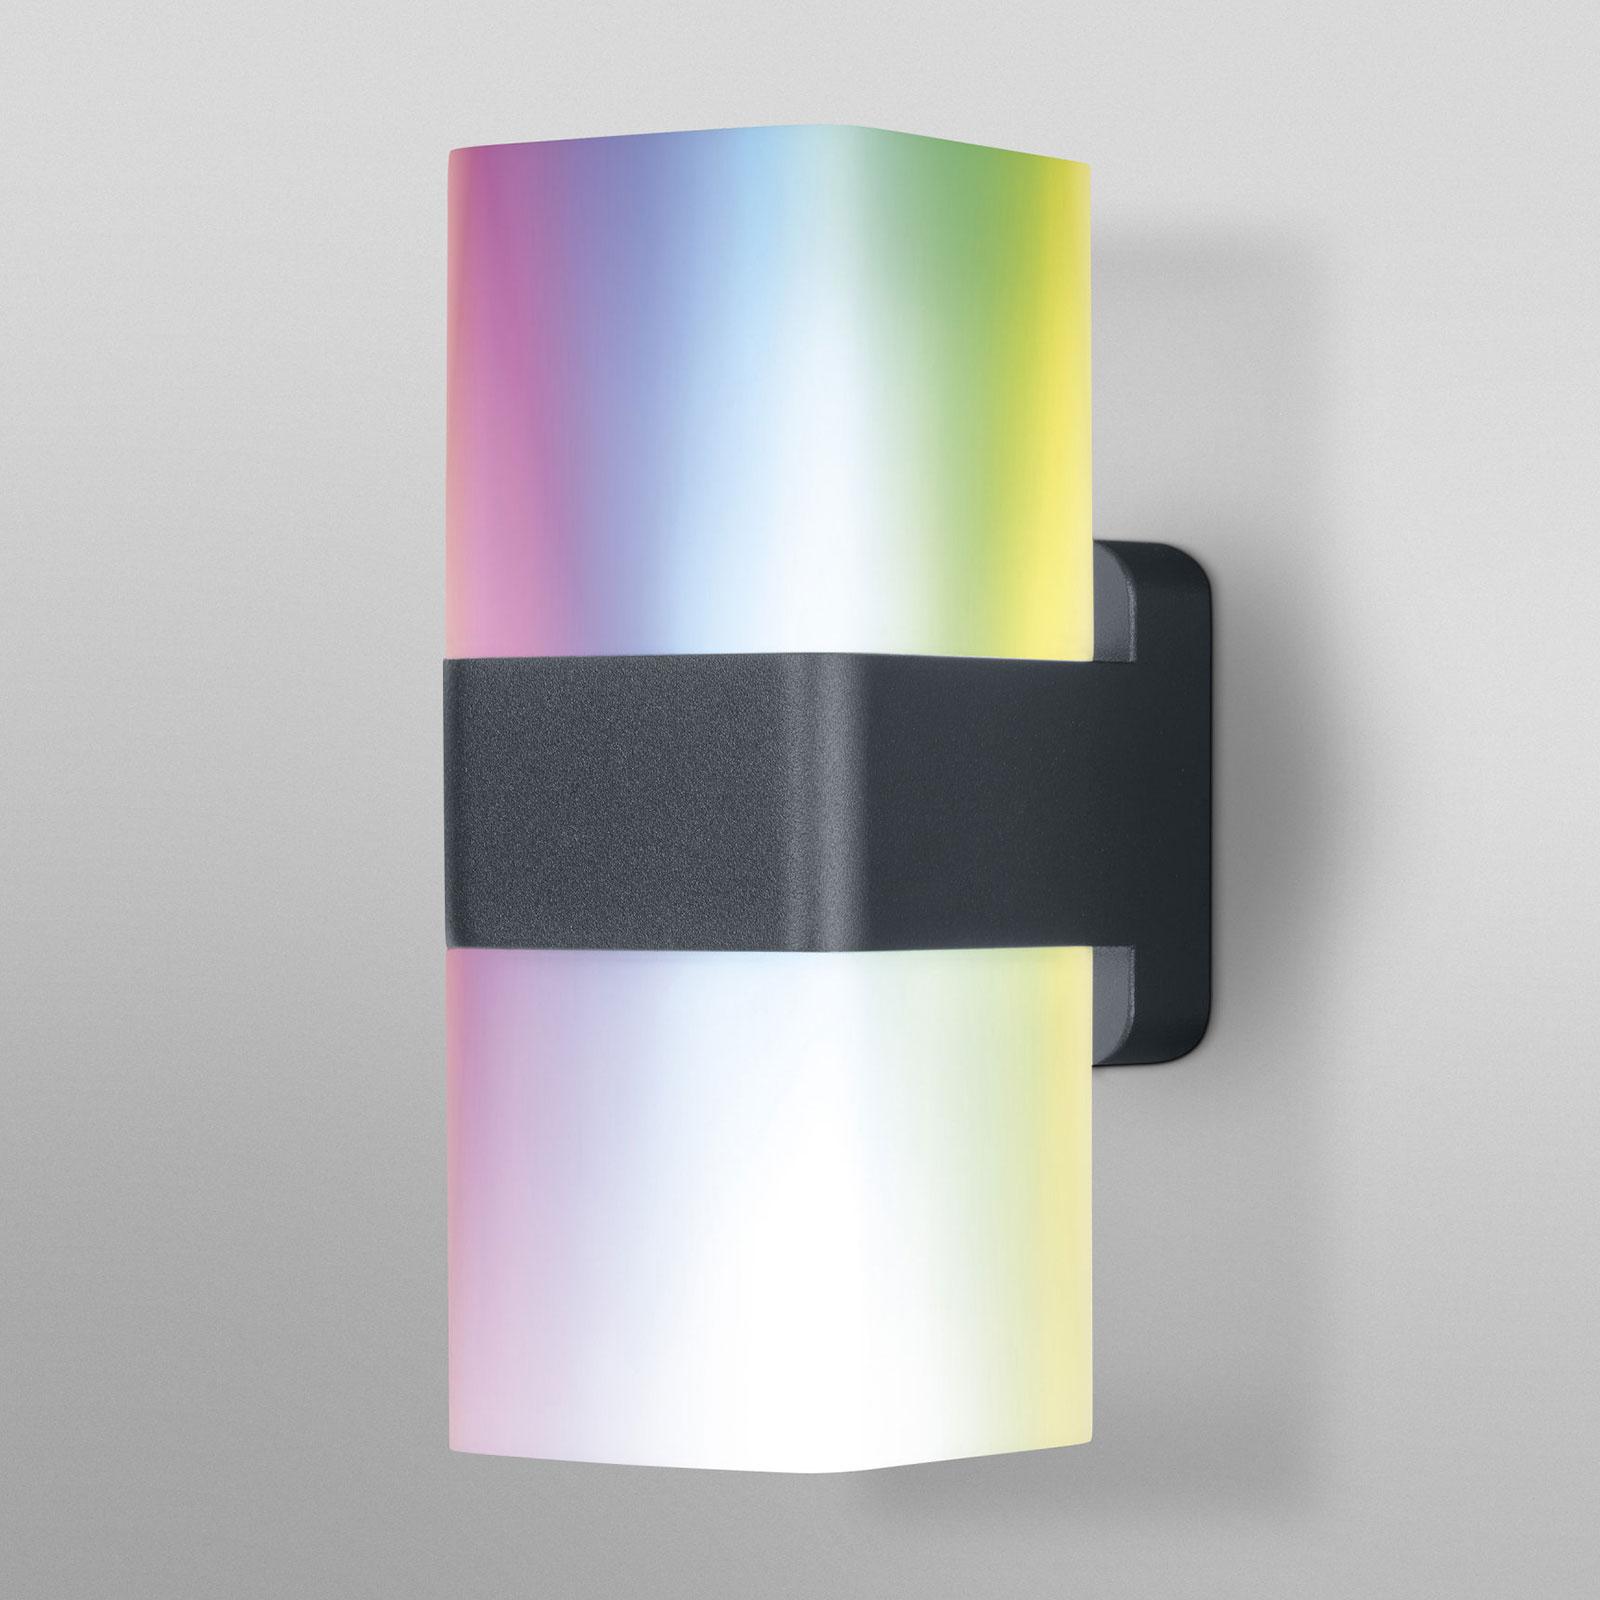 LEDVANCE SMART+ WiFi Cube vegglampe RGBW up/down